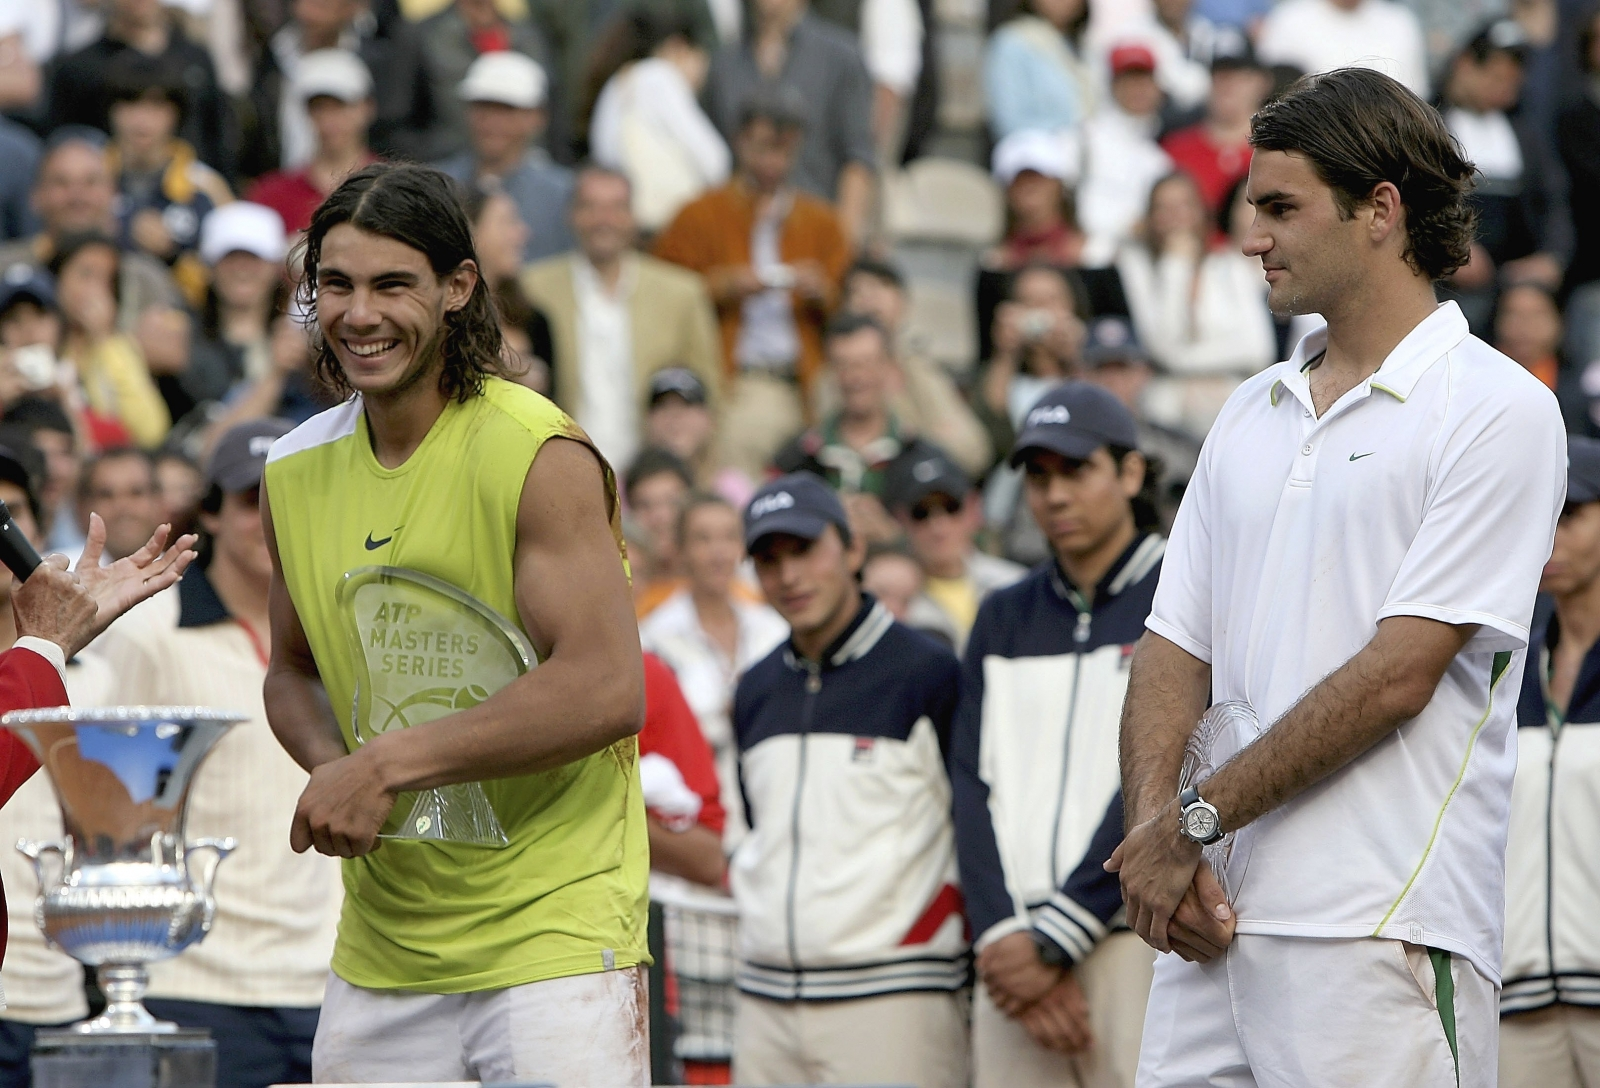 2006 ATP final